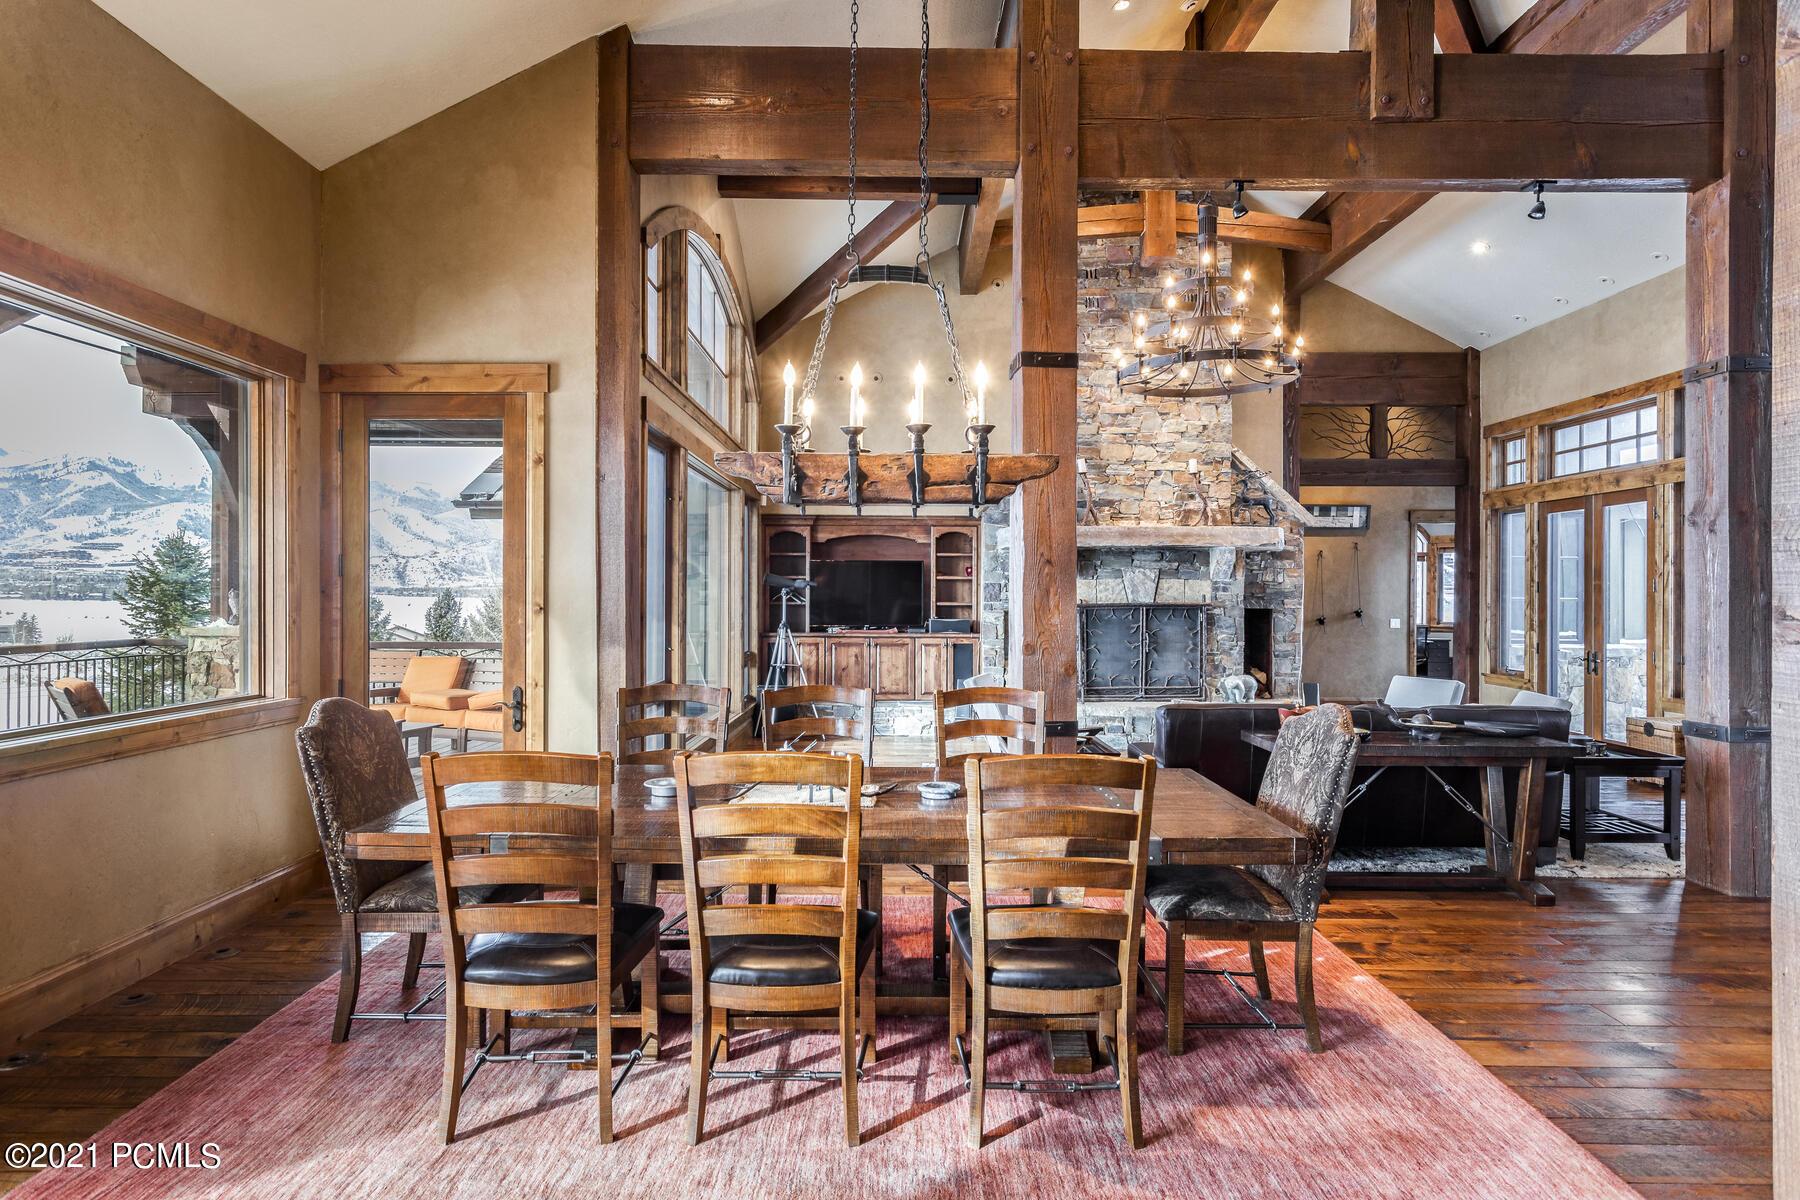 6170 Trailside Drive, Park City, Utah 84098, 5 Bedrooms Bedrooms, ,7 BathroomsBathrooms,Single Family,For Sale,Trailside,12100719